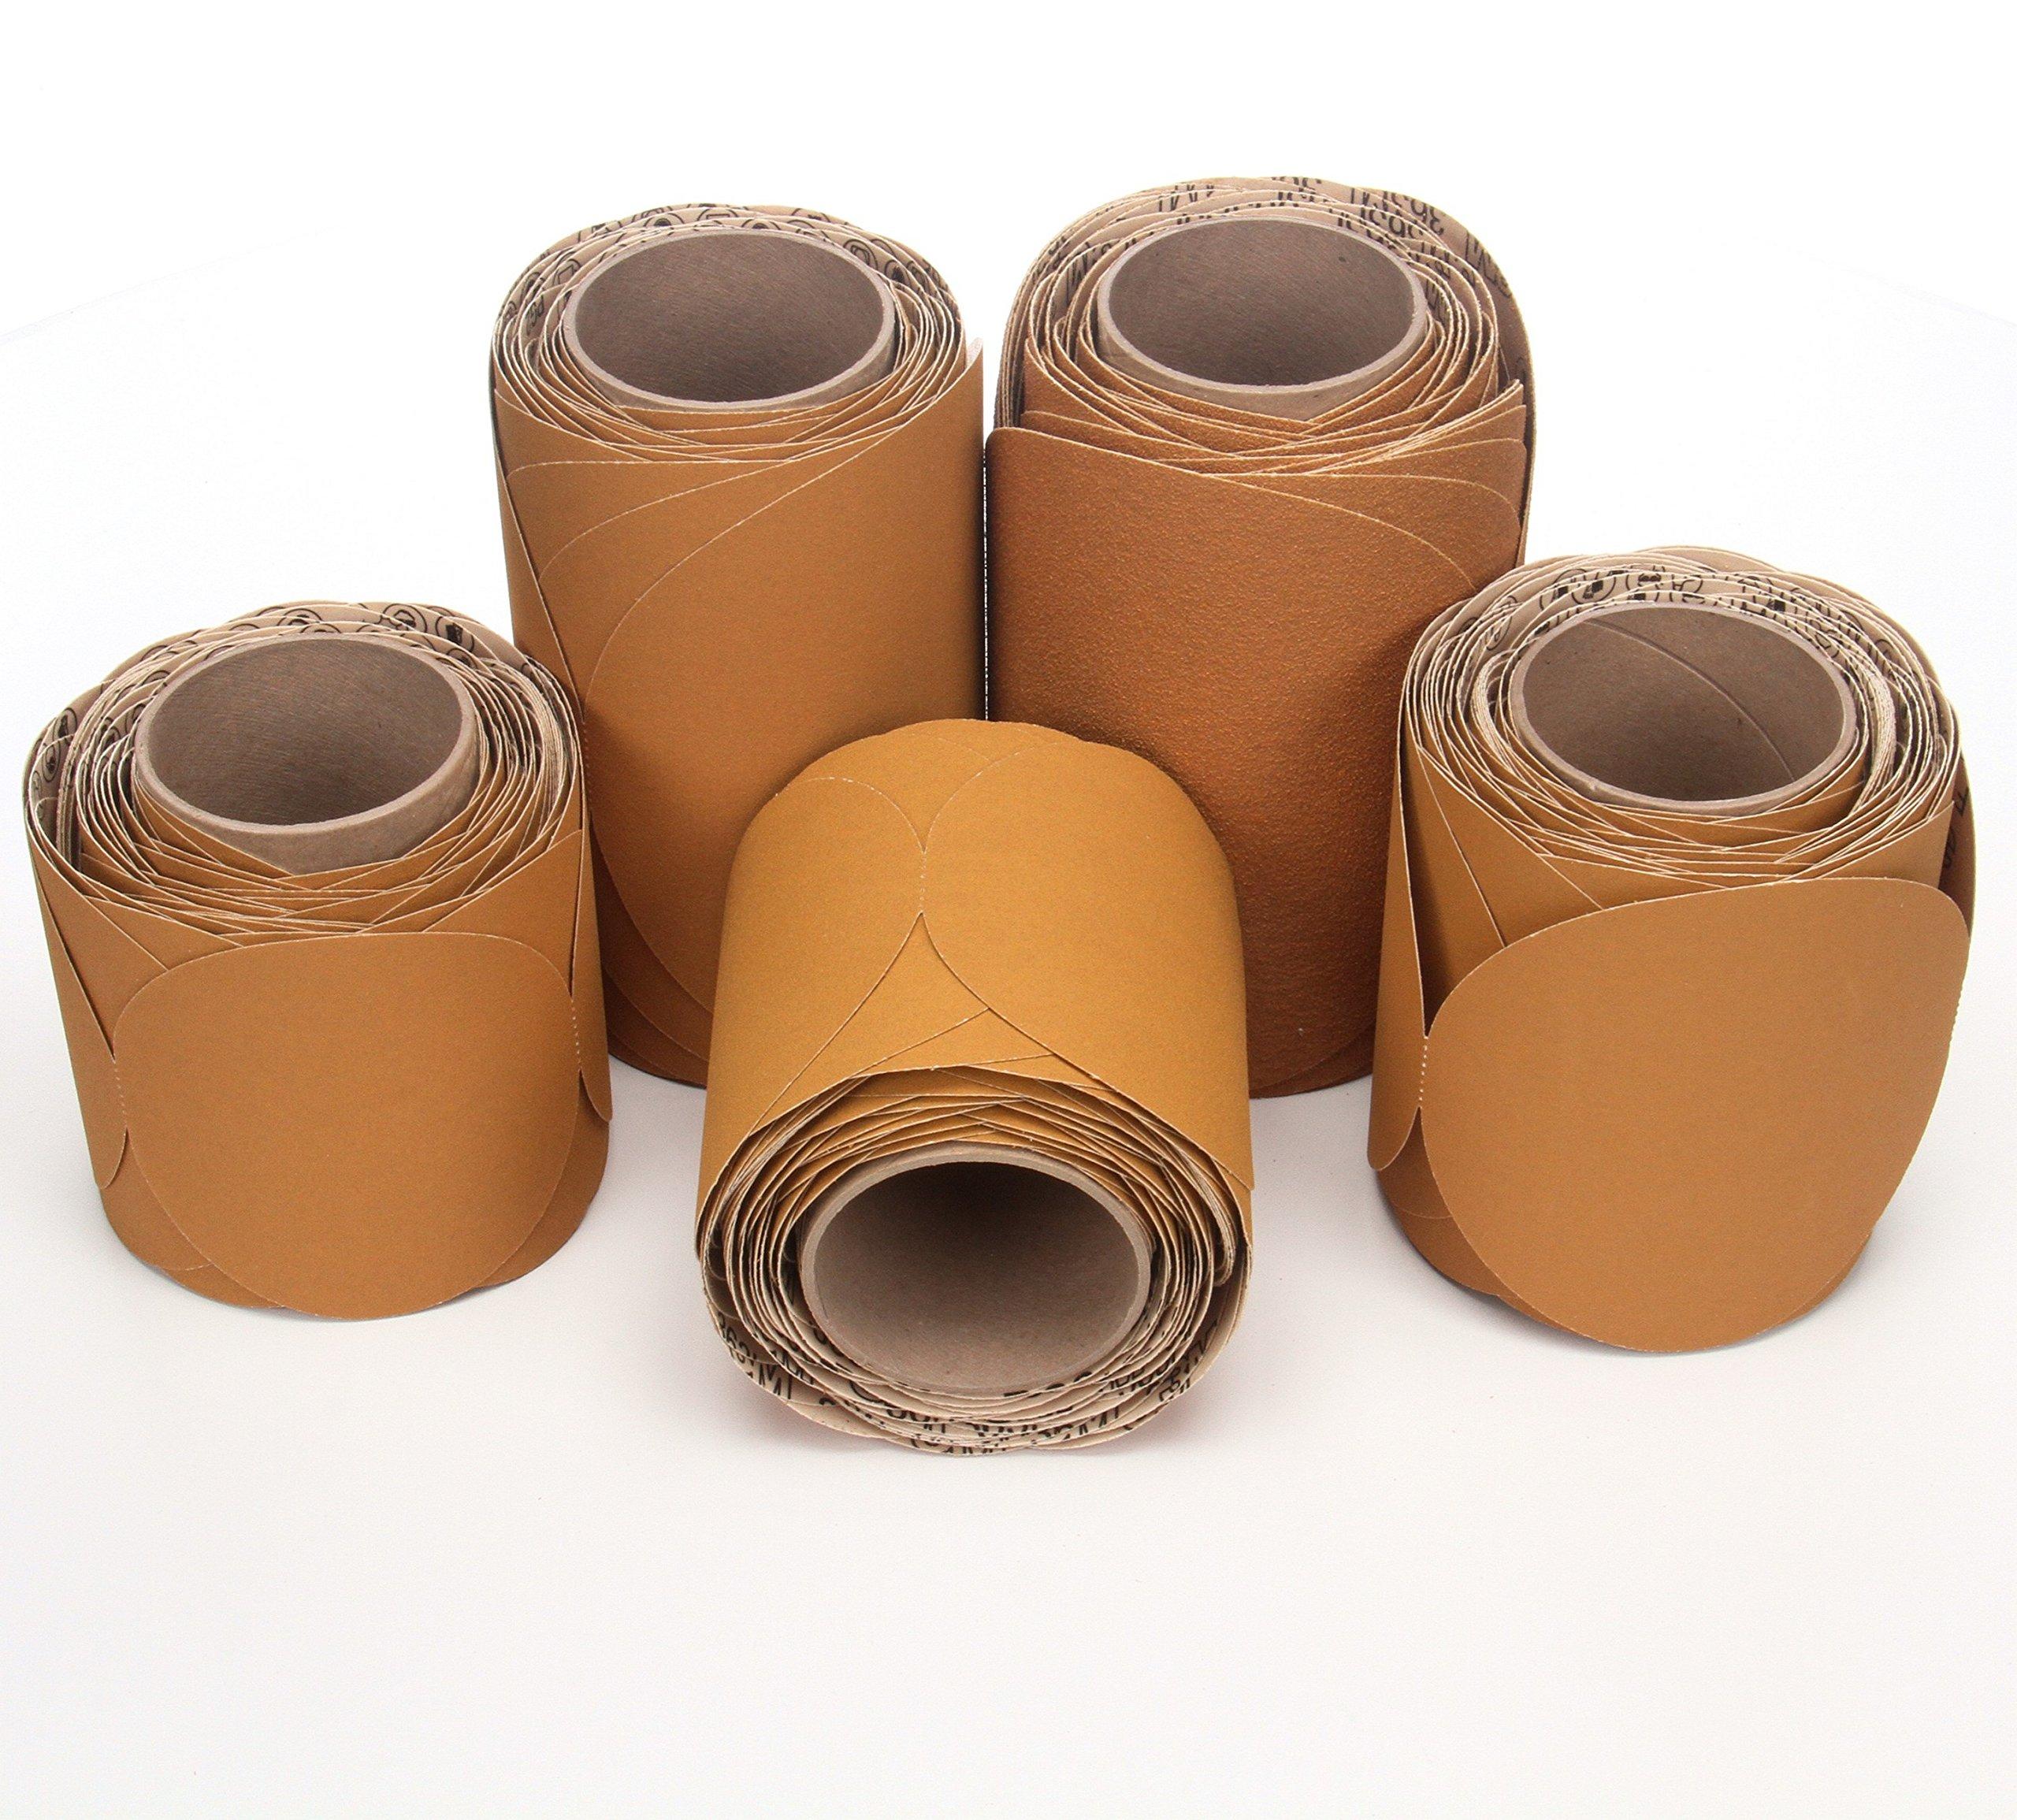 3M Stikit Paper Disc Roll 363I, PSA Attachment, Aluminum Oxide, 8'' Diameter, P150 Grit (Roll of 50) by Cubitron (Image #2)